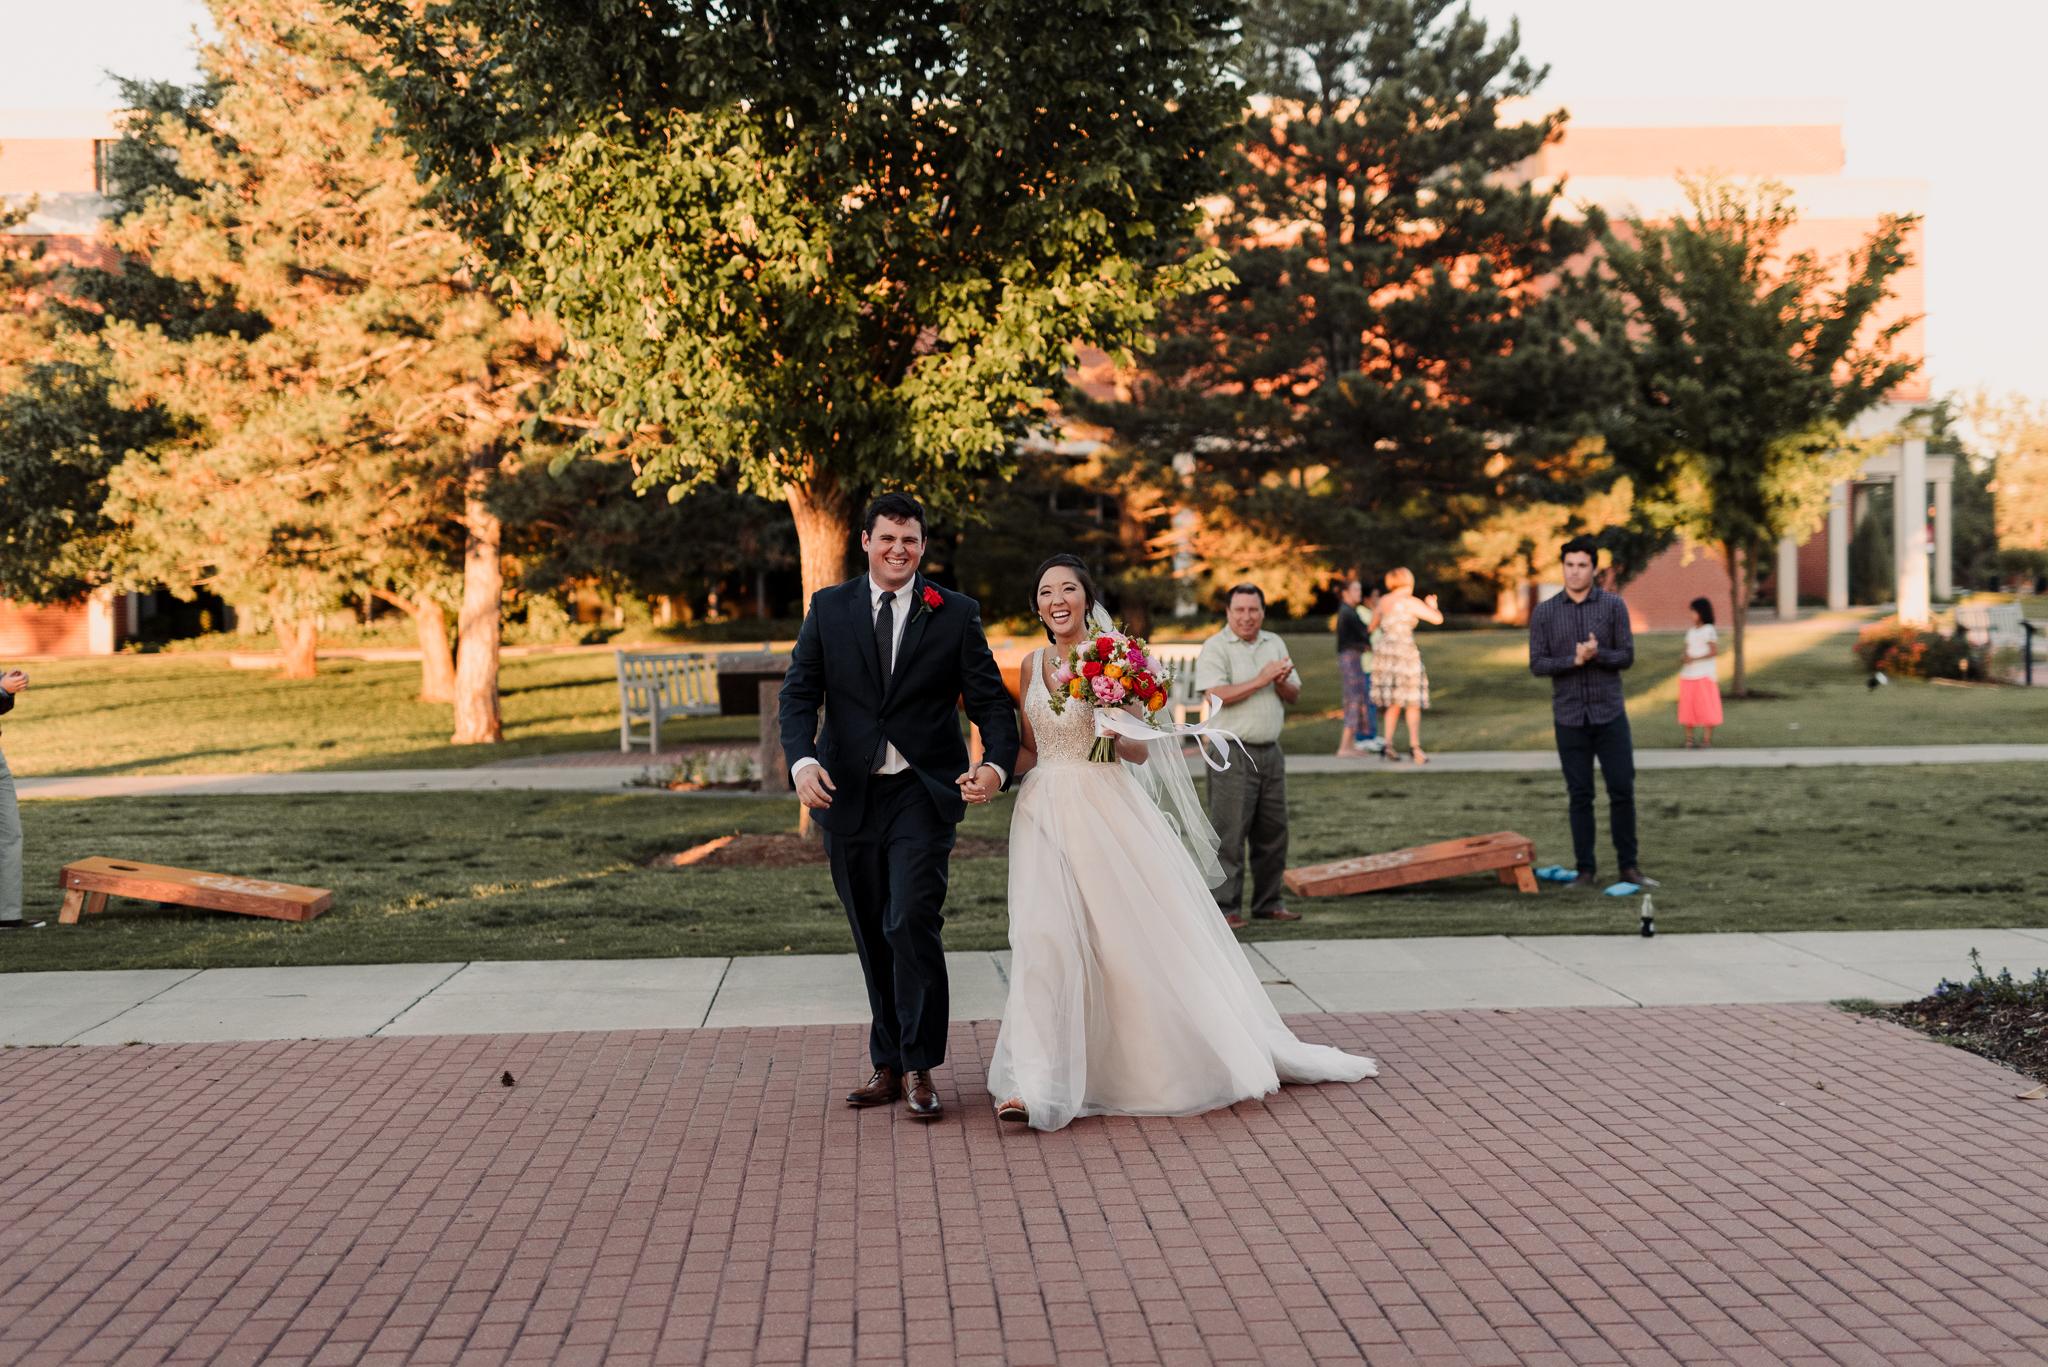 Oklahoma-Christian-University-Wedding-9105.jpg